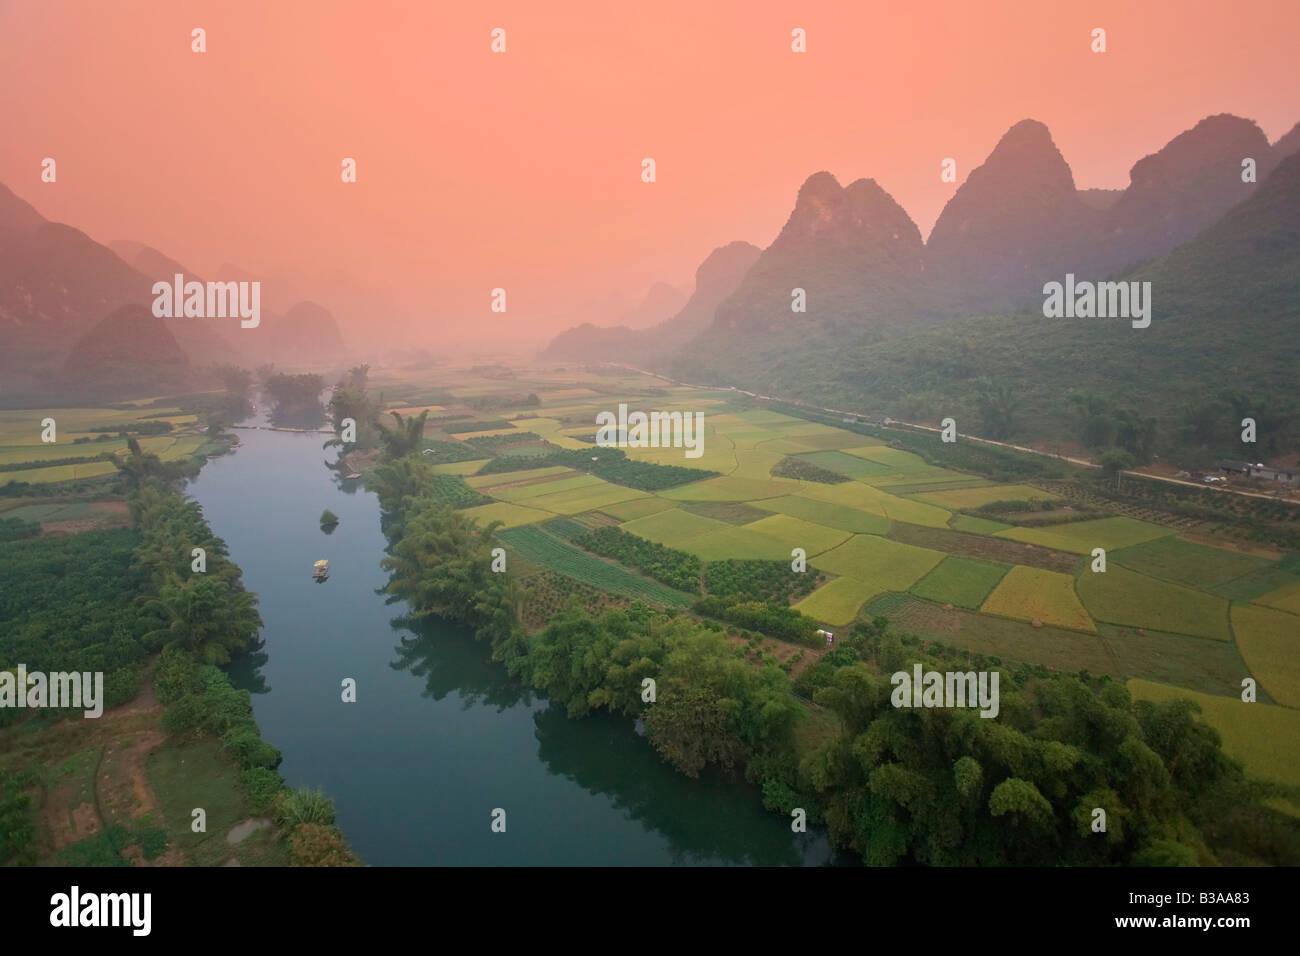 Carso paesaggio di montagna & fiume Li da una mongolfiera, Yangshuo, Guilin, provincia di Guangxi, Cina Foto Stock